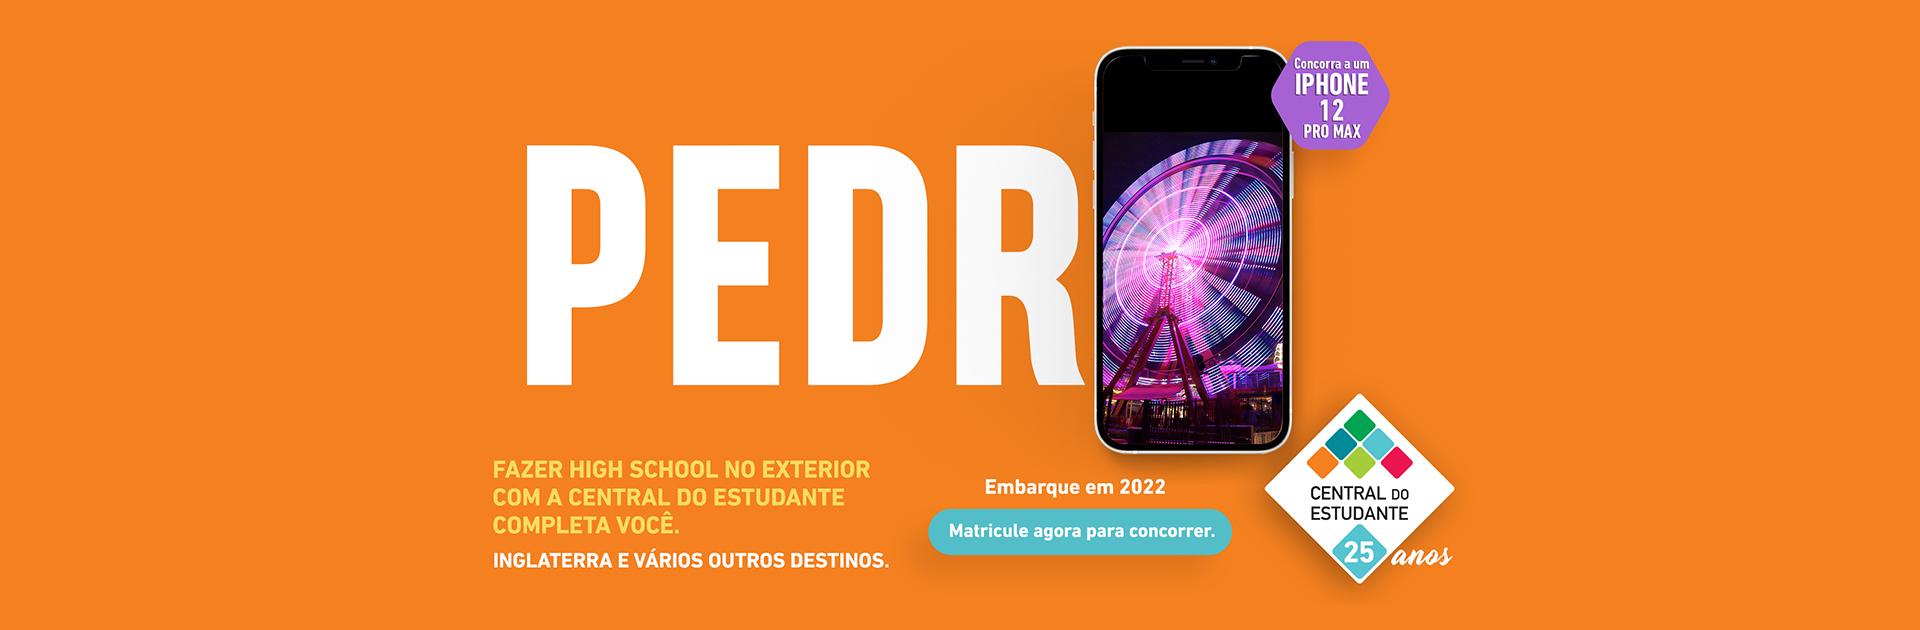 10185_central_estudantes_campanha2022_Alunos_pedro